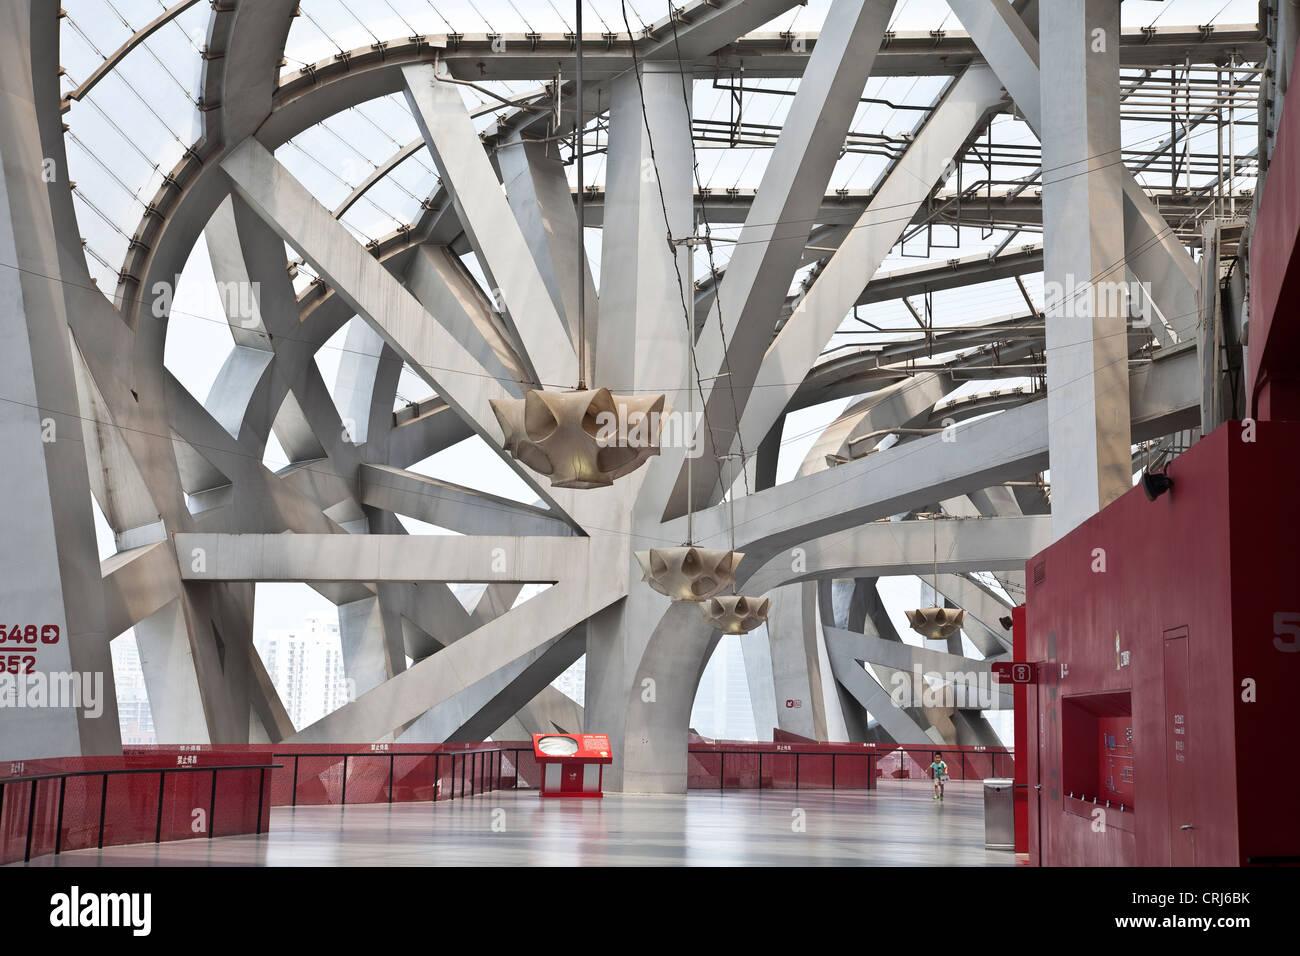 Interior of the Beijing National Stadium or 'Bird's Nest', Beijing, China - Stock Image